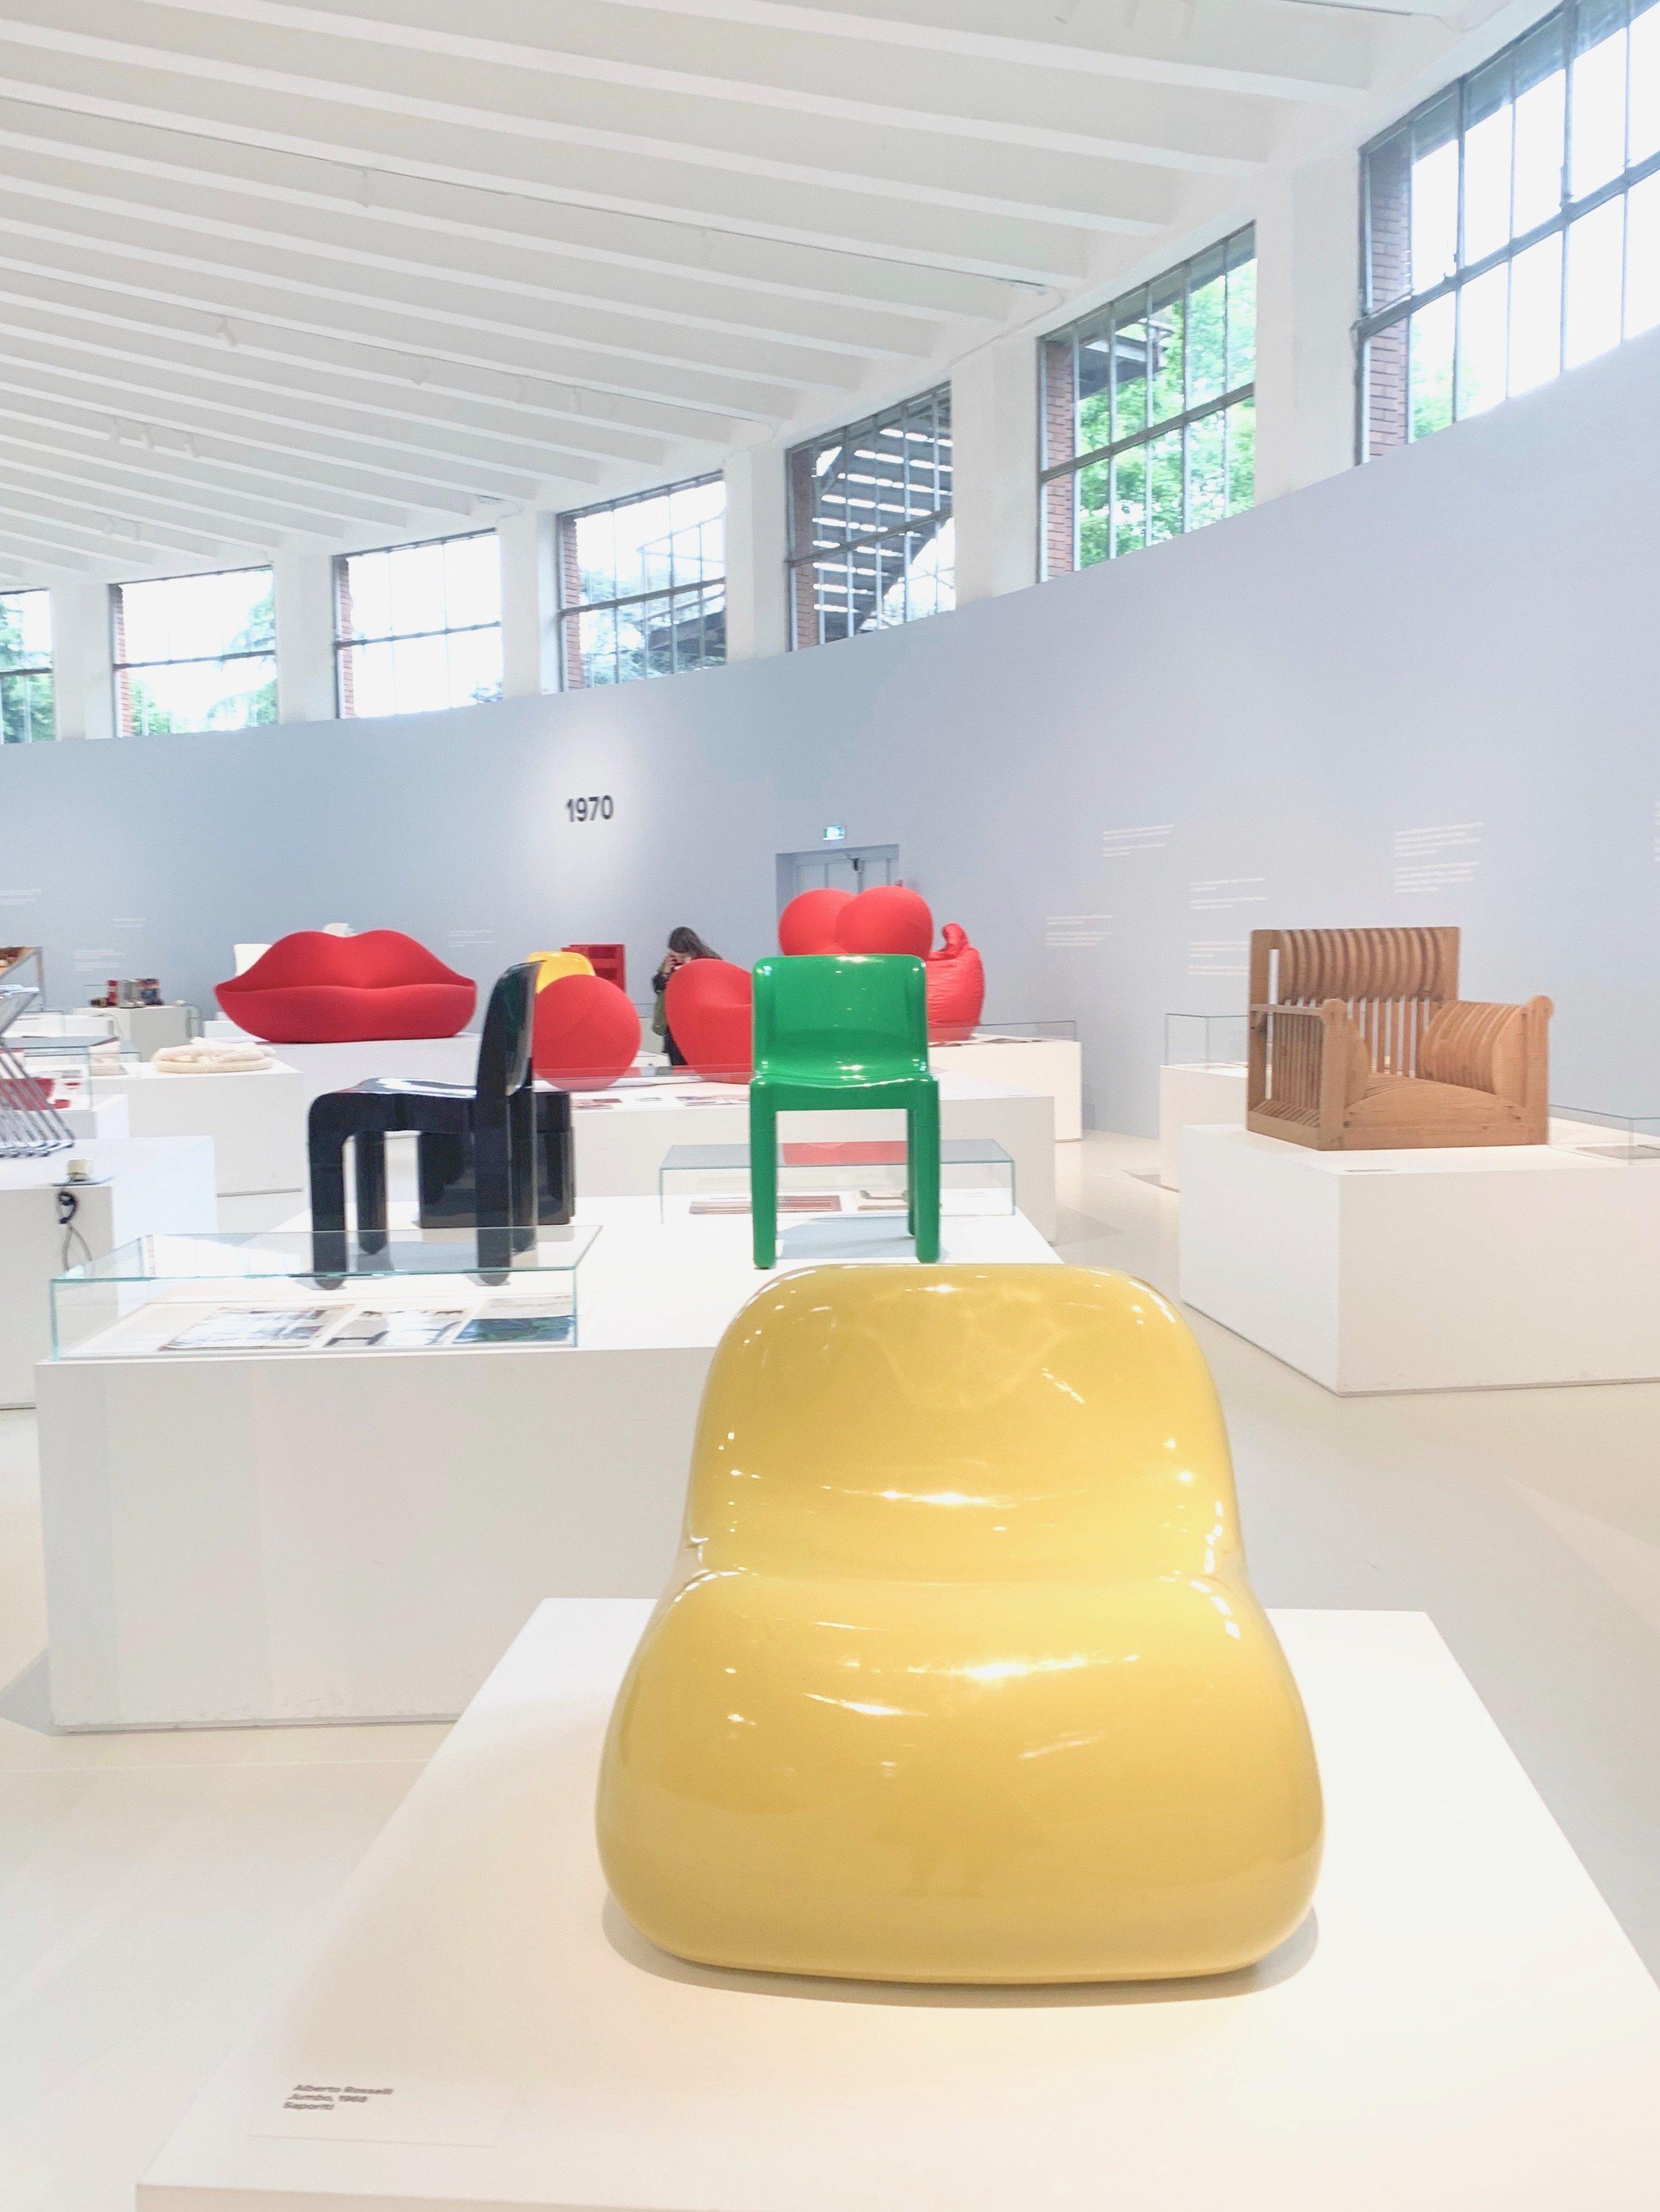 Museum Of Italian Design - Italian Mid Century Modern Furniture Designitalia00024.jpeg